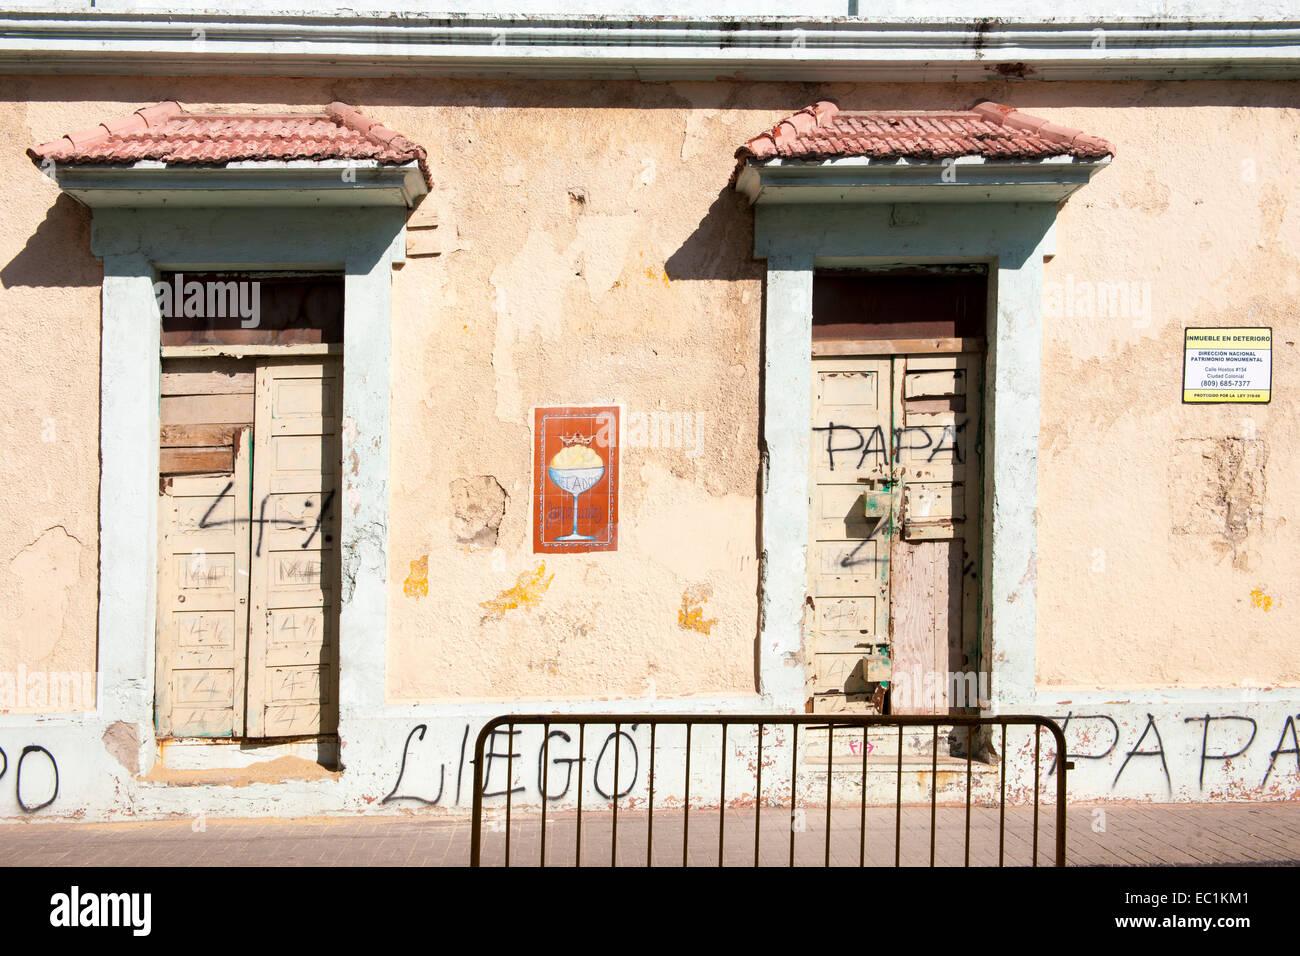 Dominikanische Republik, Santo Domingo, Zona Colonial, - Stock Image